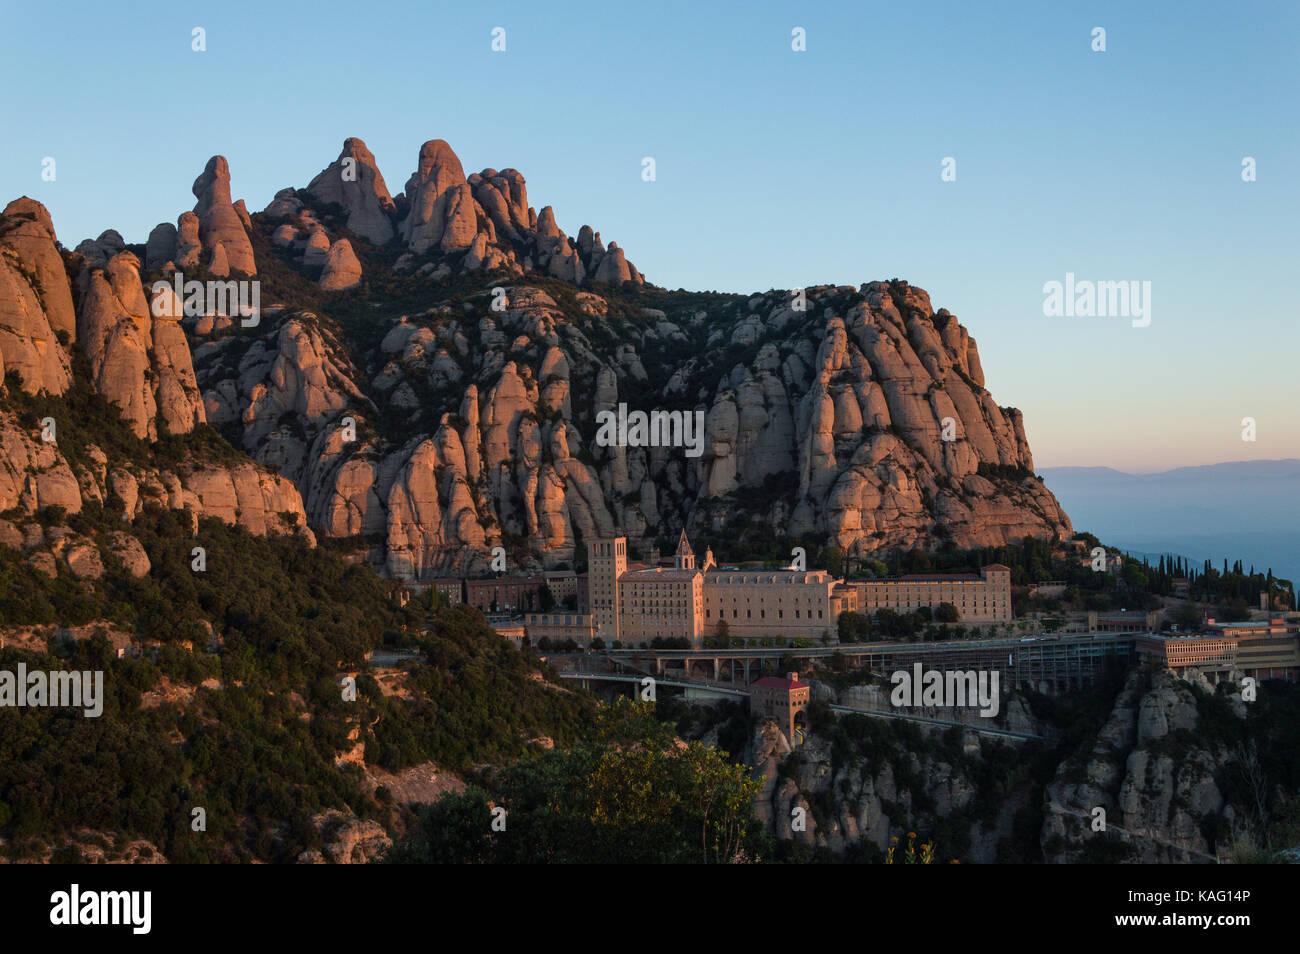 Monastery of Montserrat from San Miquel cross, Barcelona - Stock Image